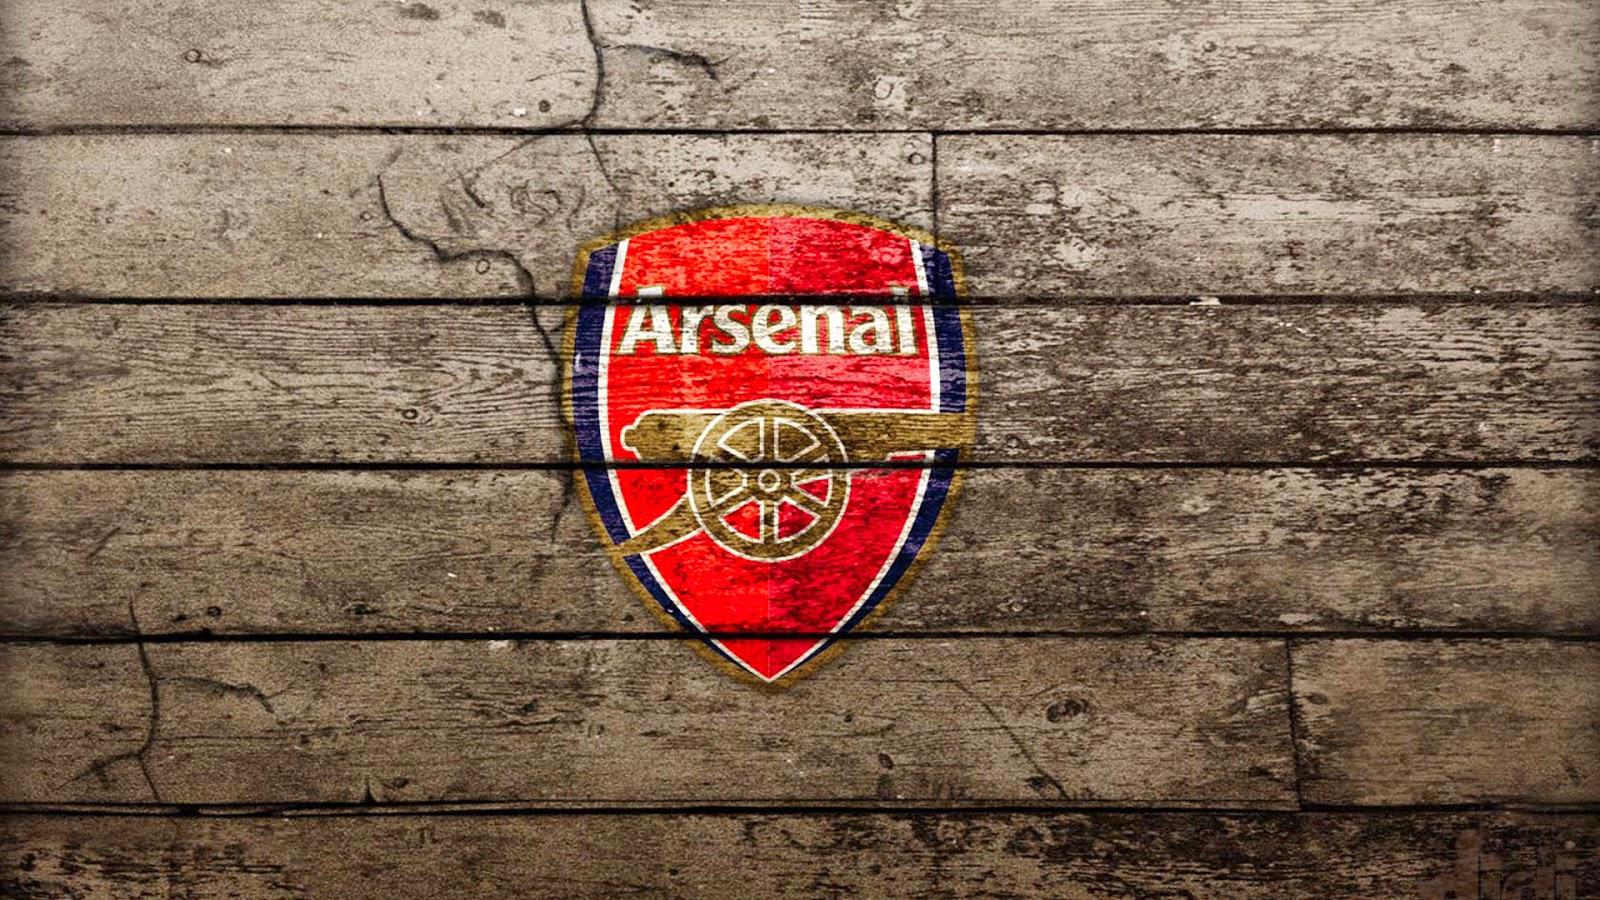 ArsenalFootballClubWallpaperFootballWallpaperHd